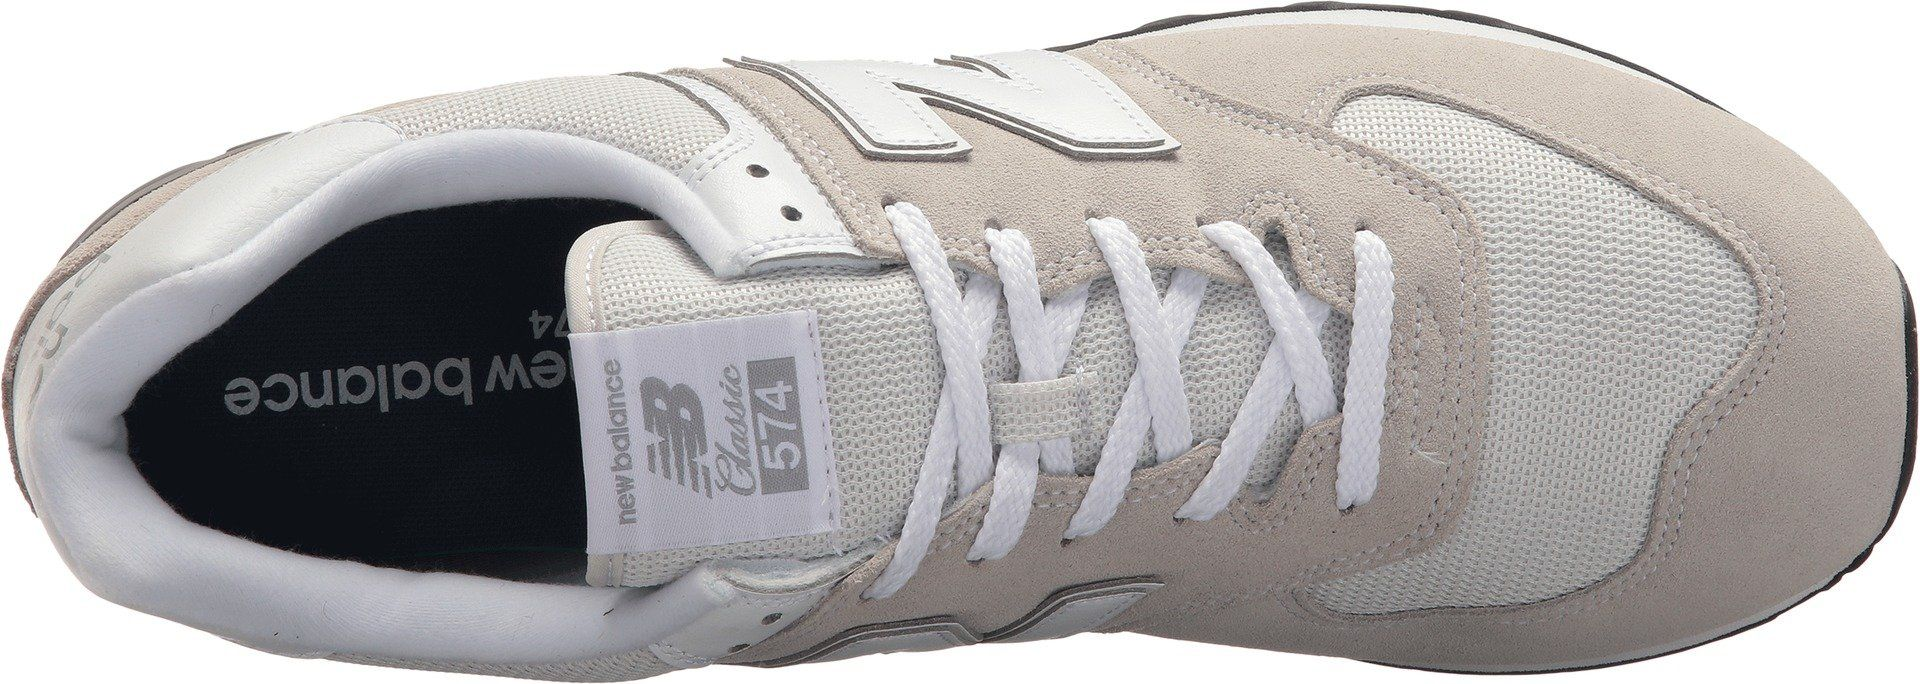 New Balance Mens 574v2 Evergreen Lifestyle Sneaker Nimbus Cloud 9 2E ...